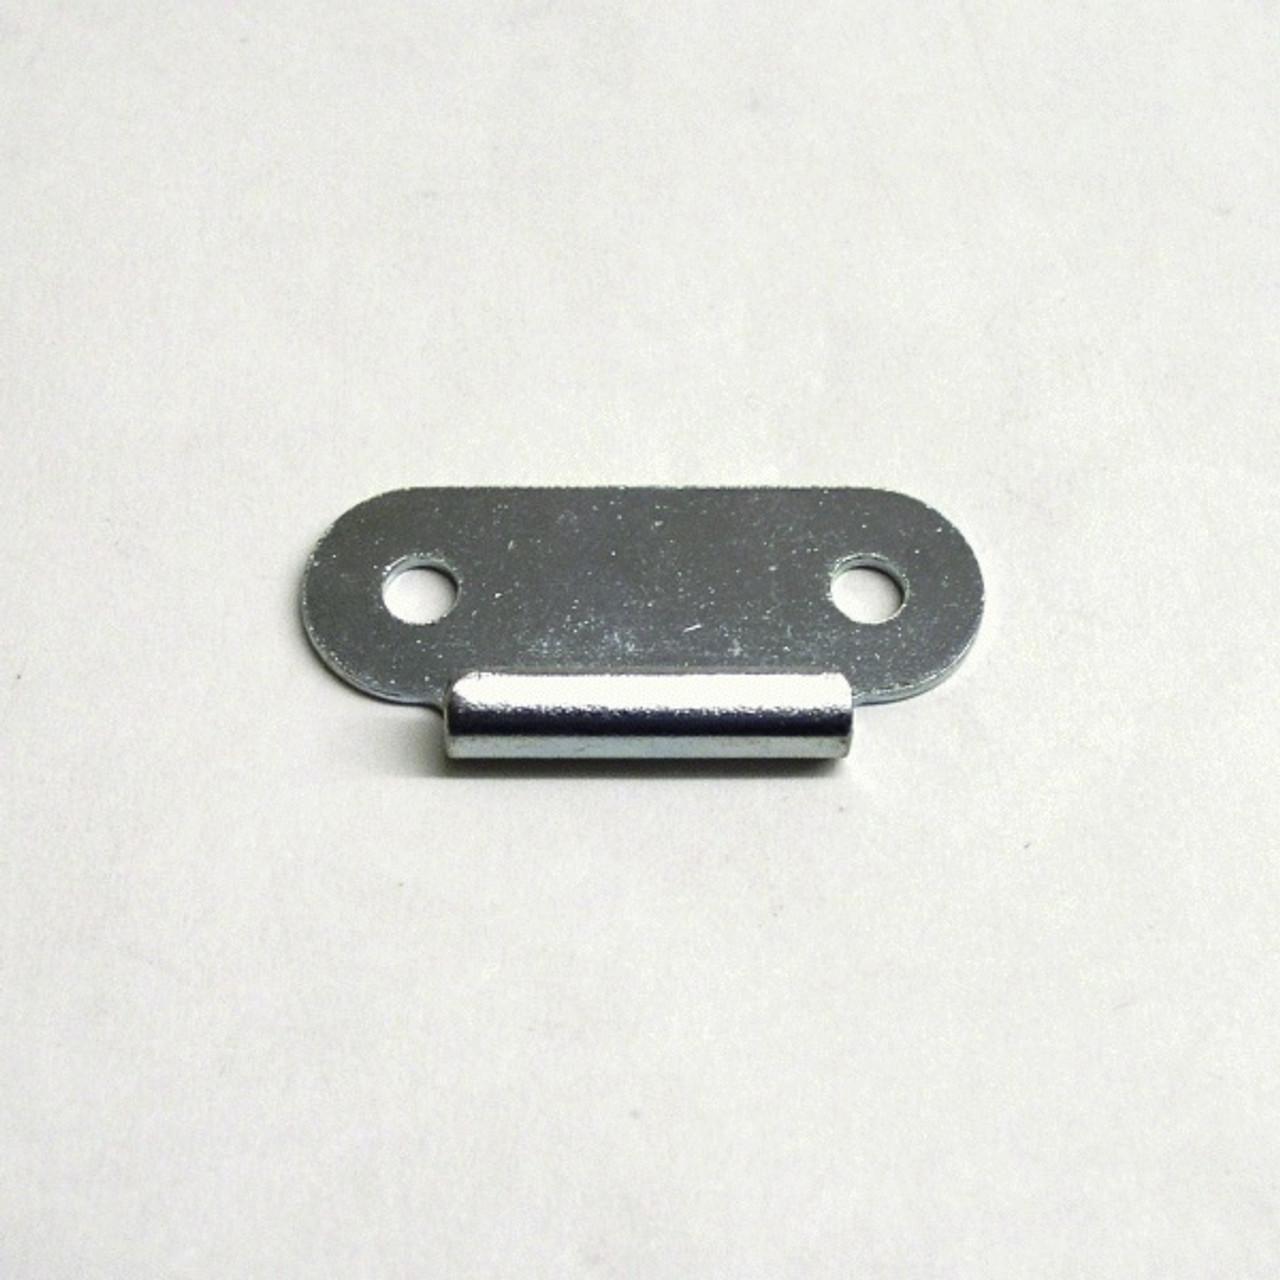 Small Surface Mount Catch/Keeper Plate - Zinc